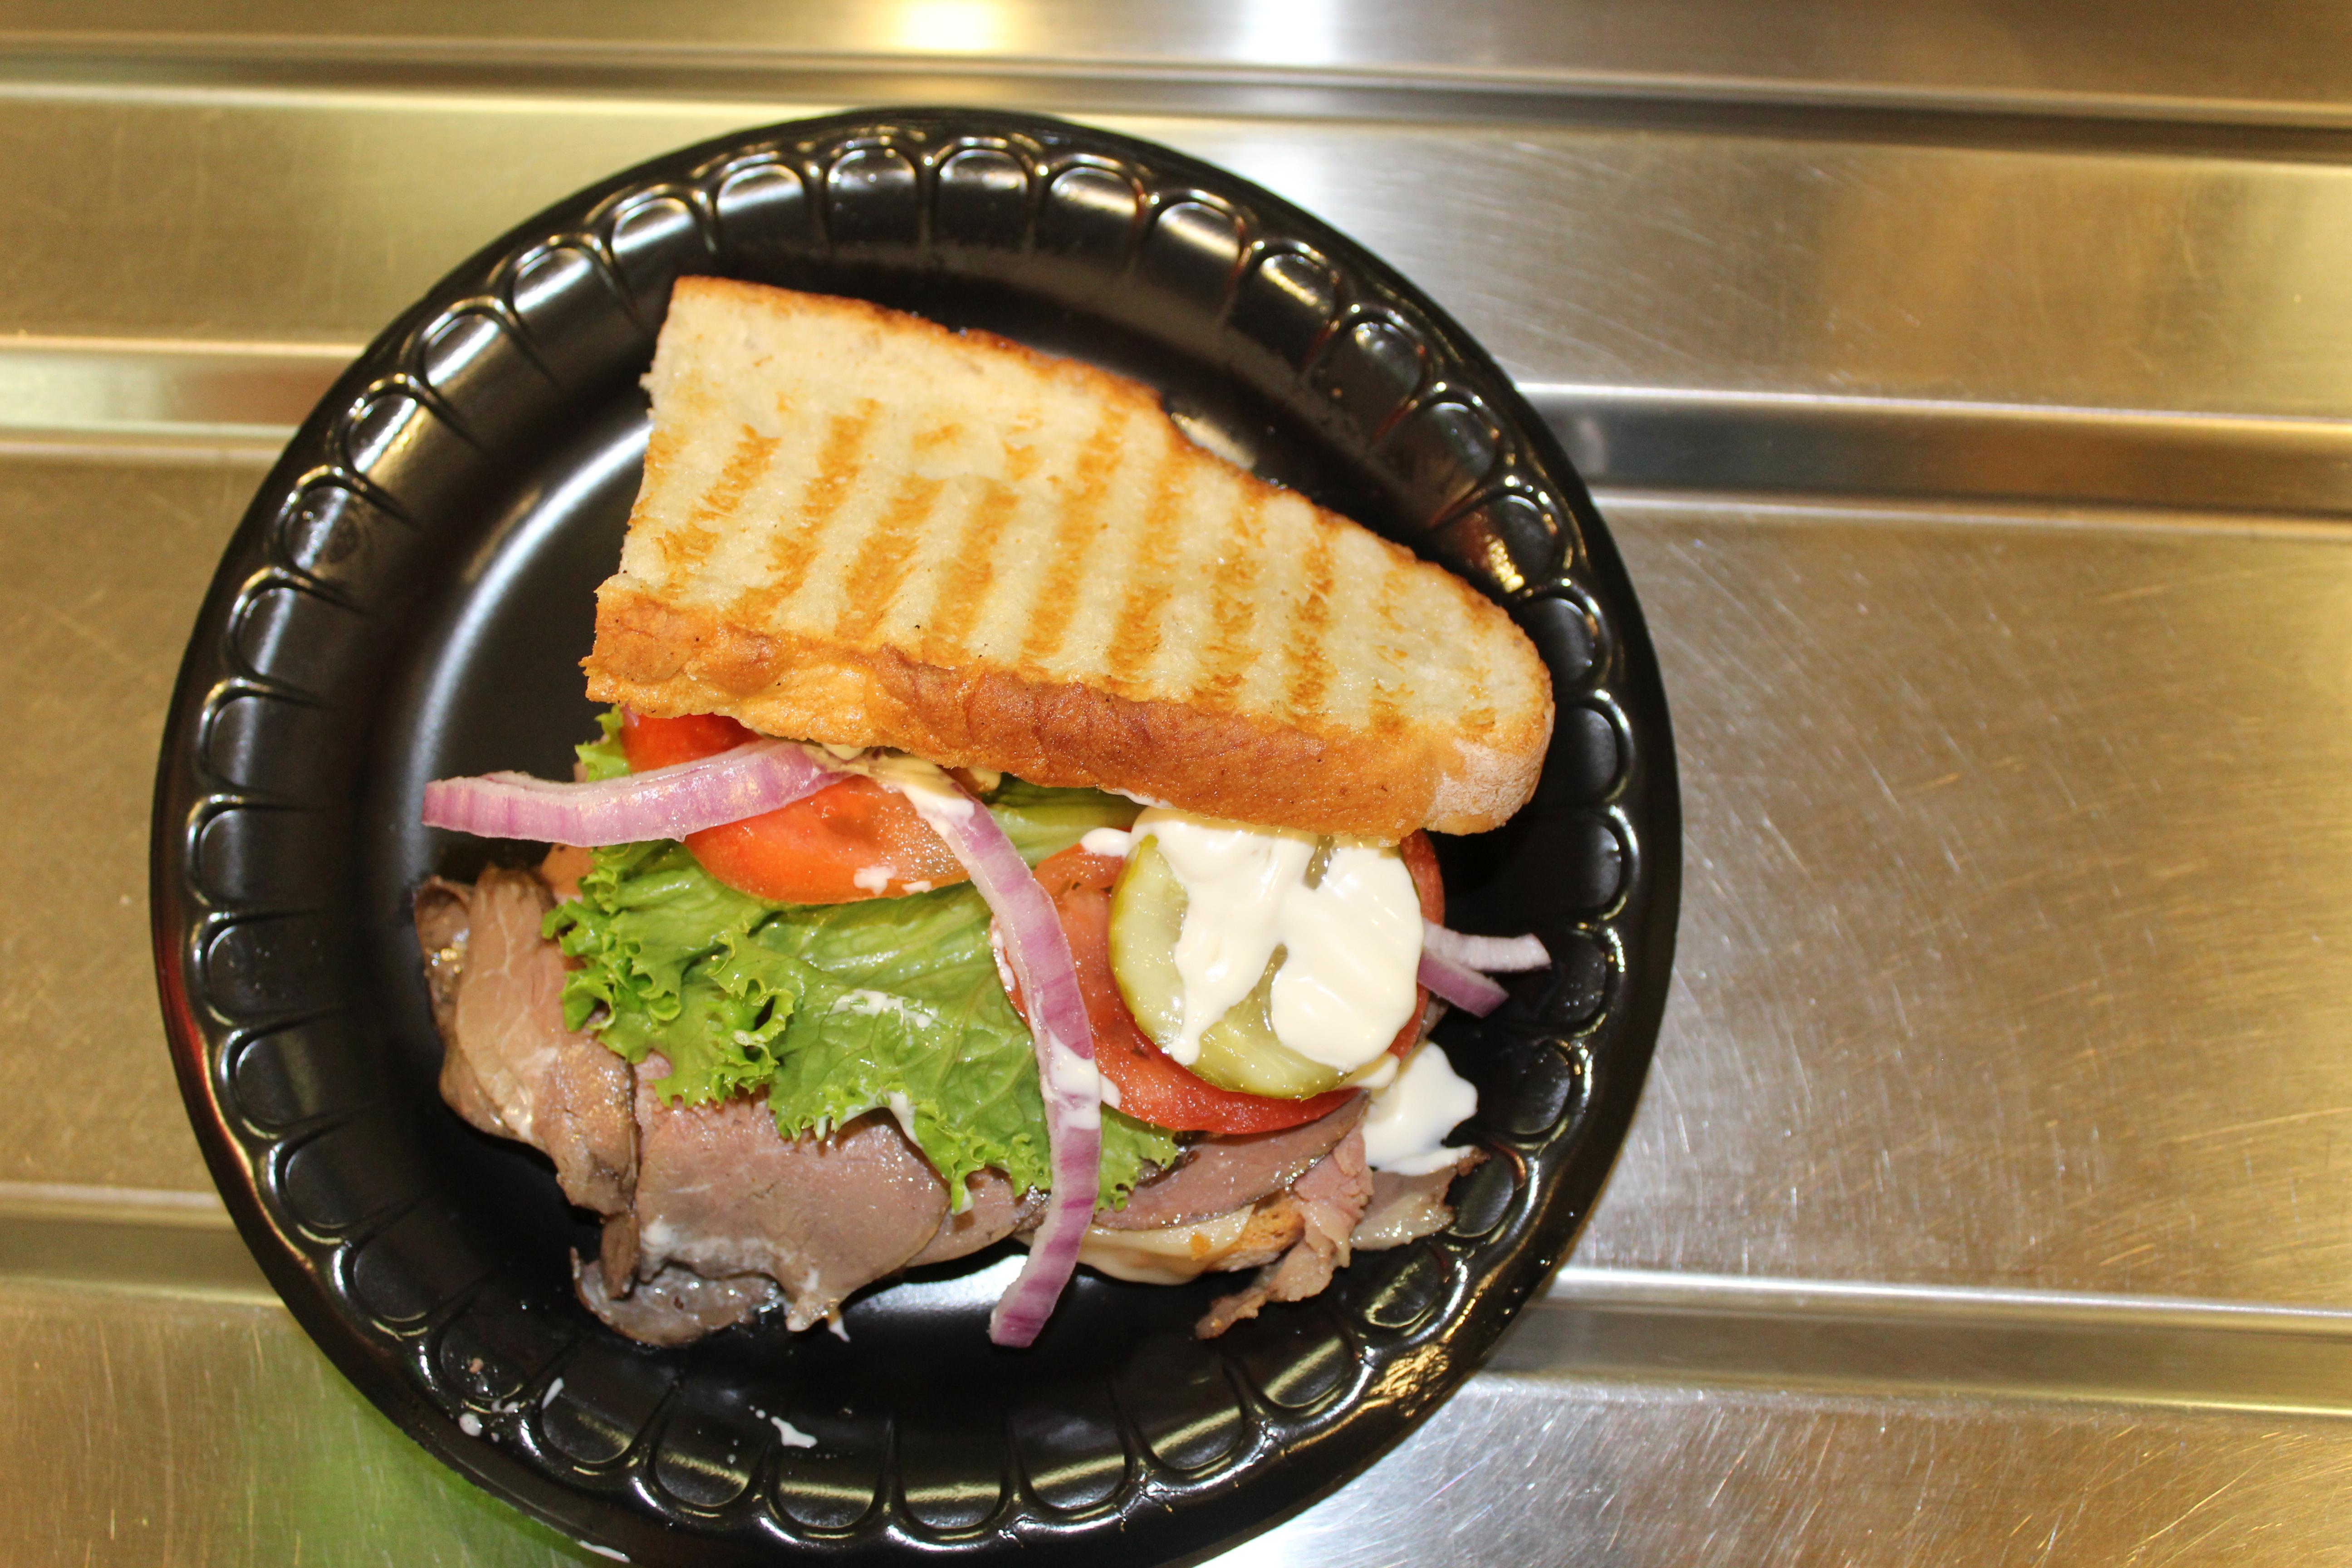 Panini sandwich on a black plastic plate.